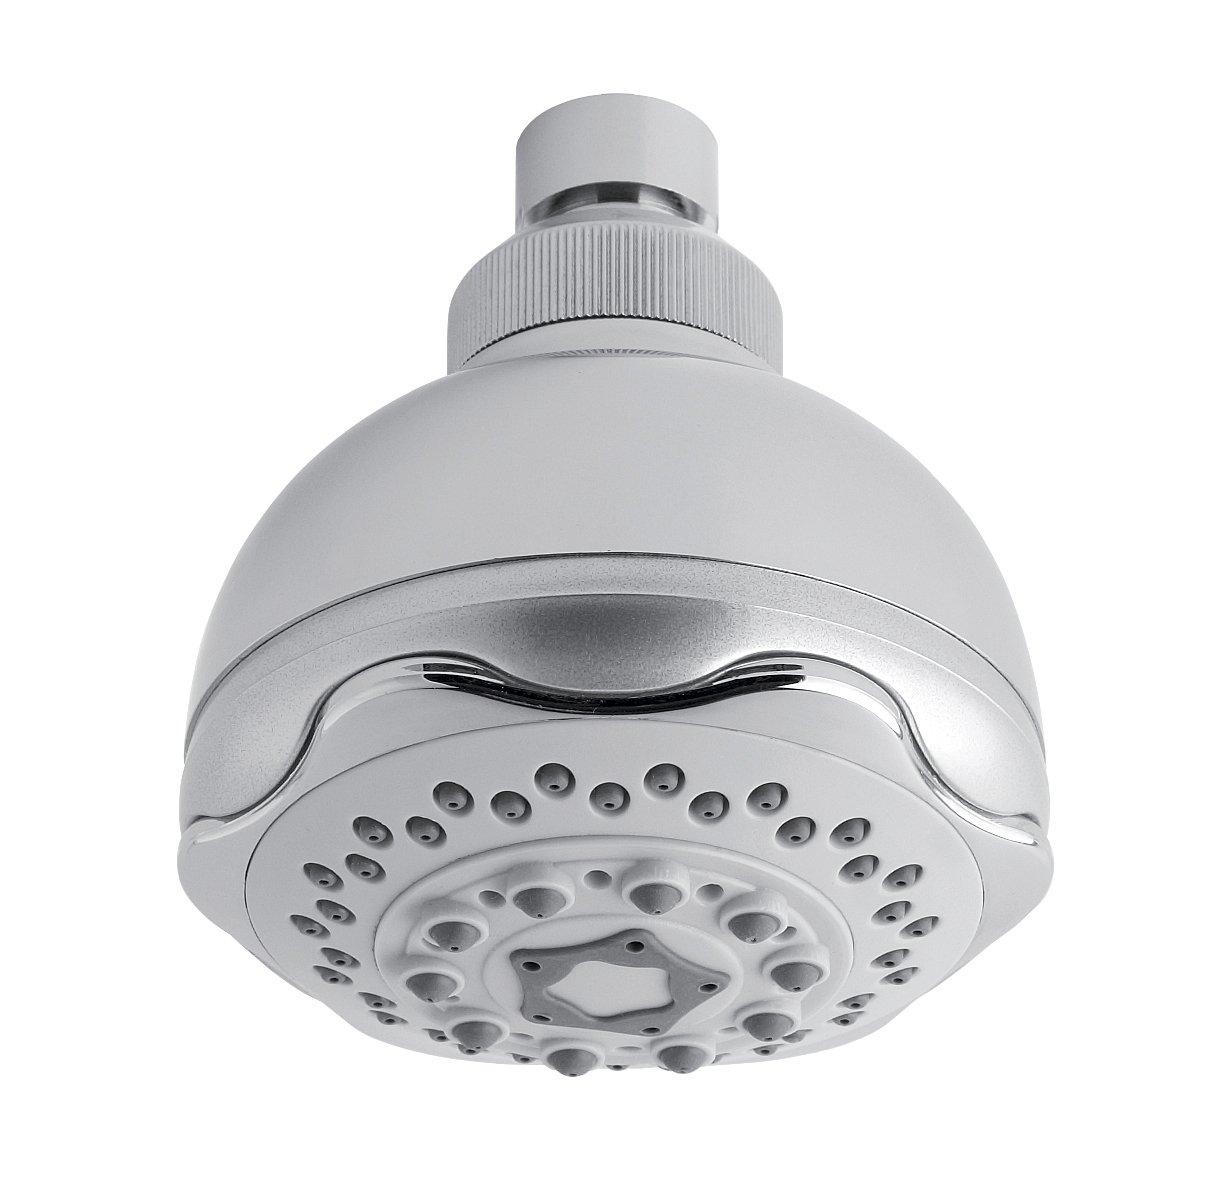 MX Group 5017706250108 Energy 5 Mode Rub Clean Fixed Showerhead ...